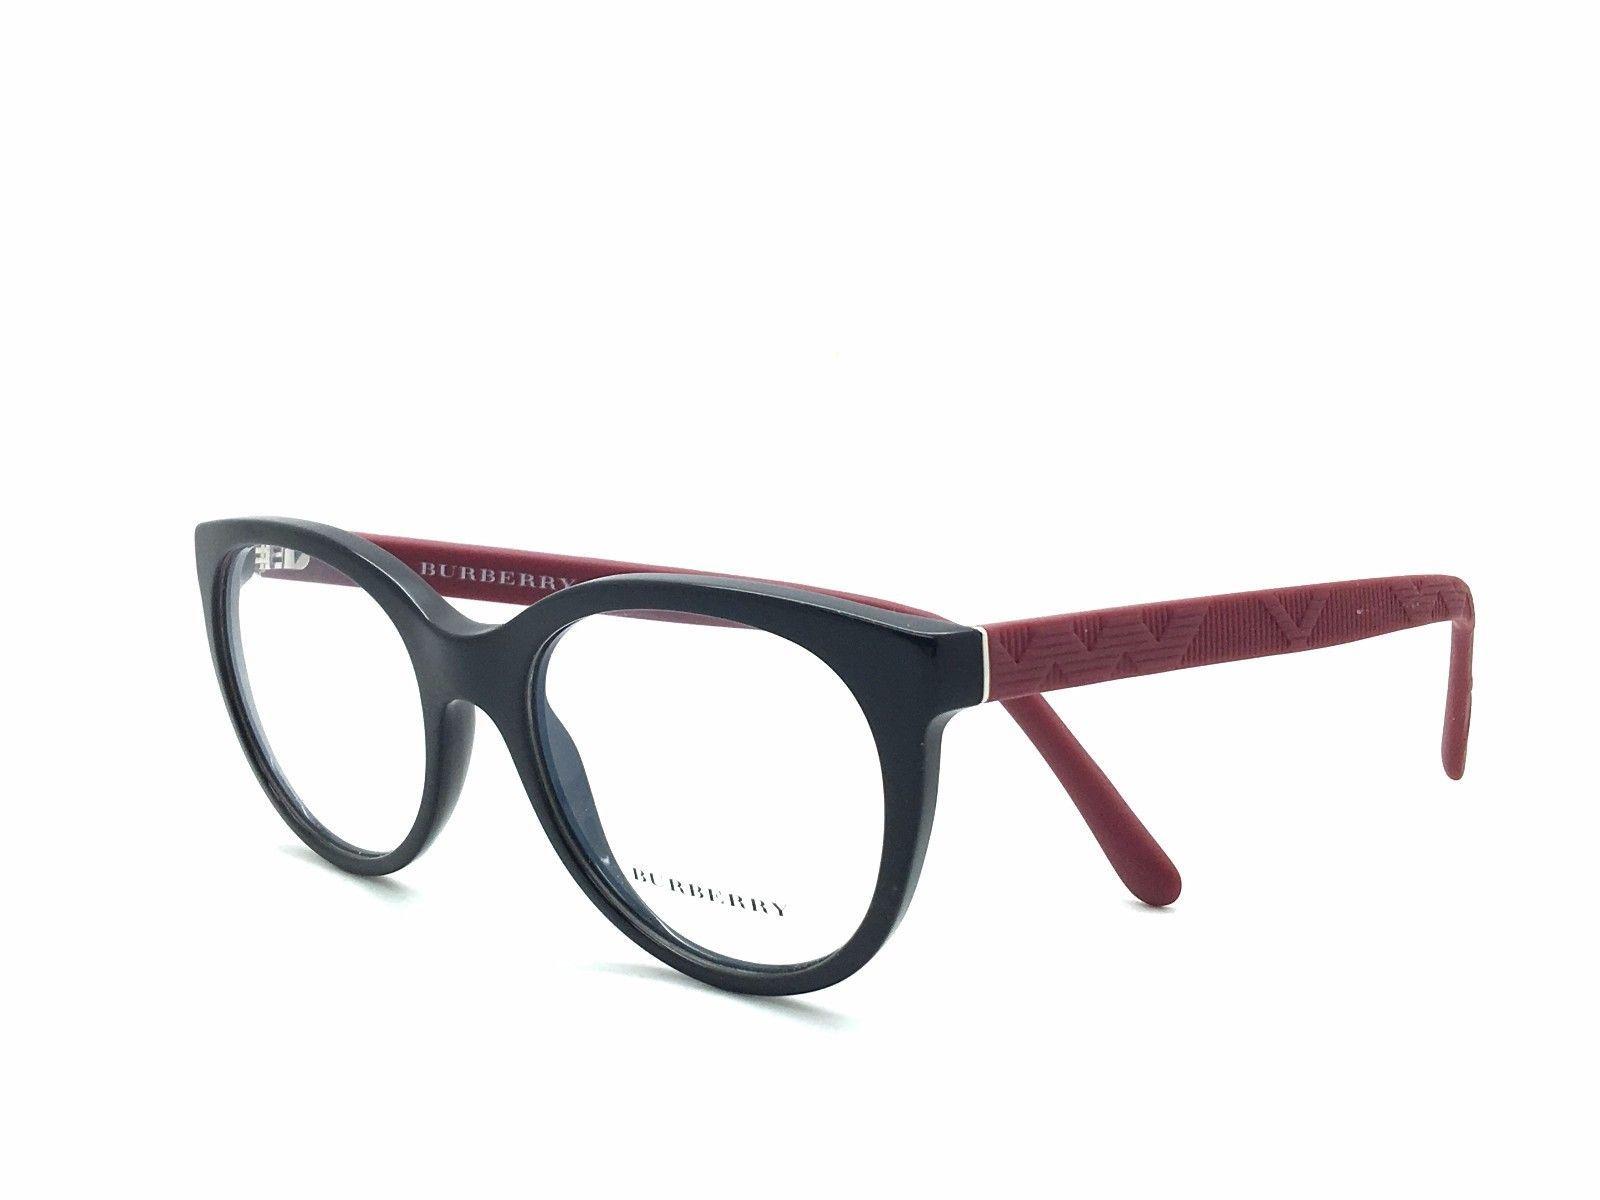 8170fd41c893 Burberry BE B 2176 Eyeglasses Frames Black and 50 similar items. 57